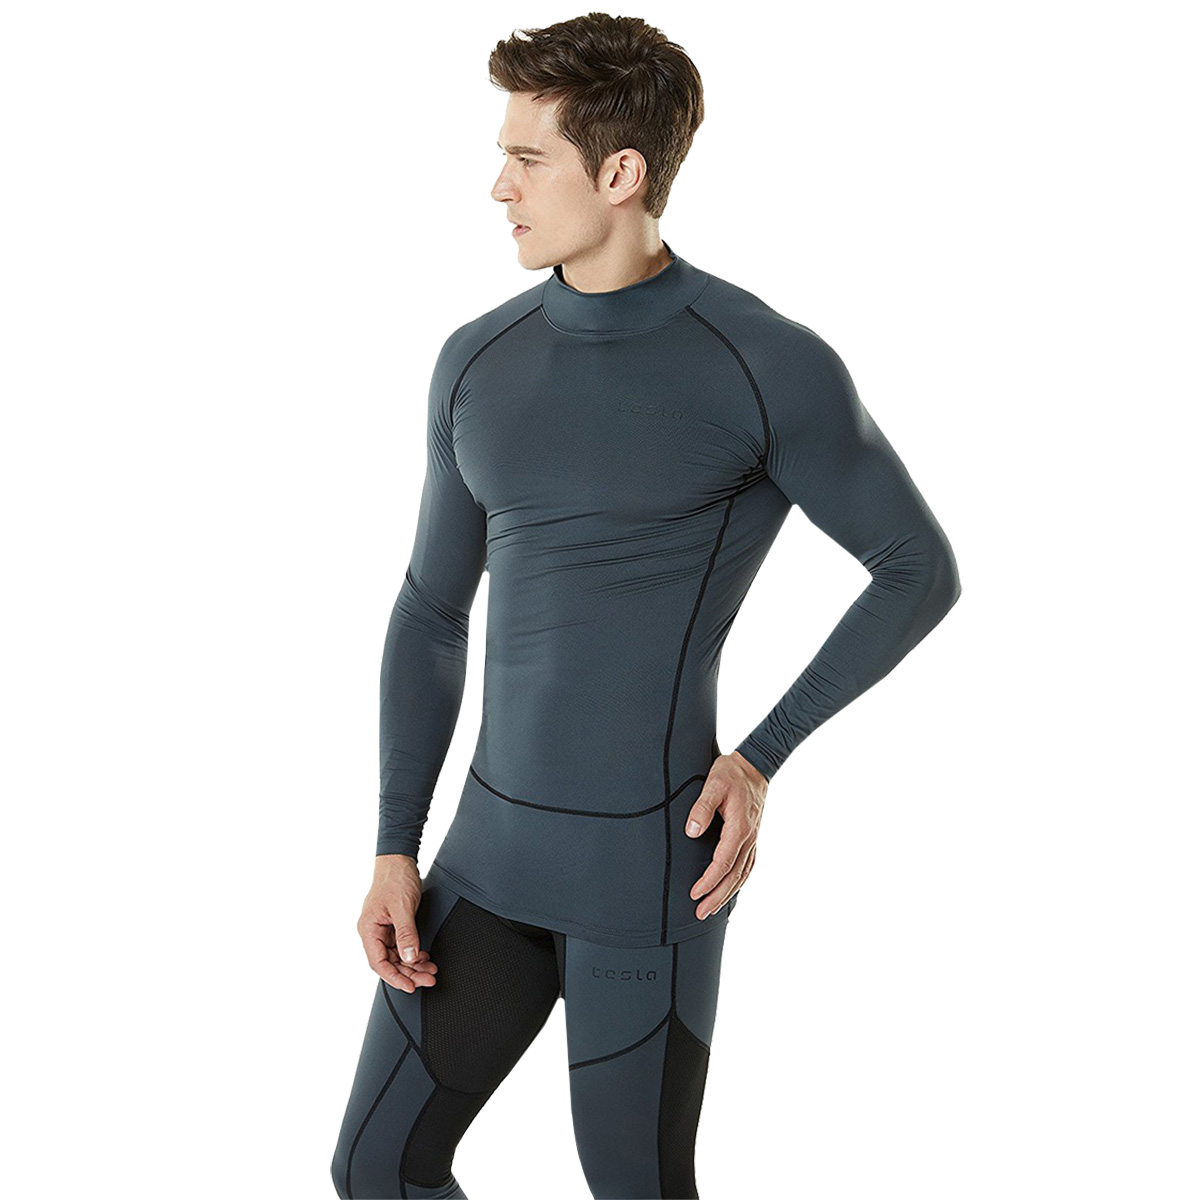 TSLA Tesla MUT72 Cool Dry Long Sleeve Compression Shirt